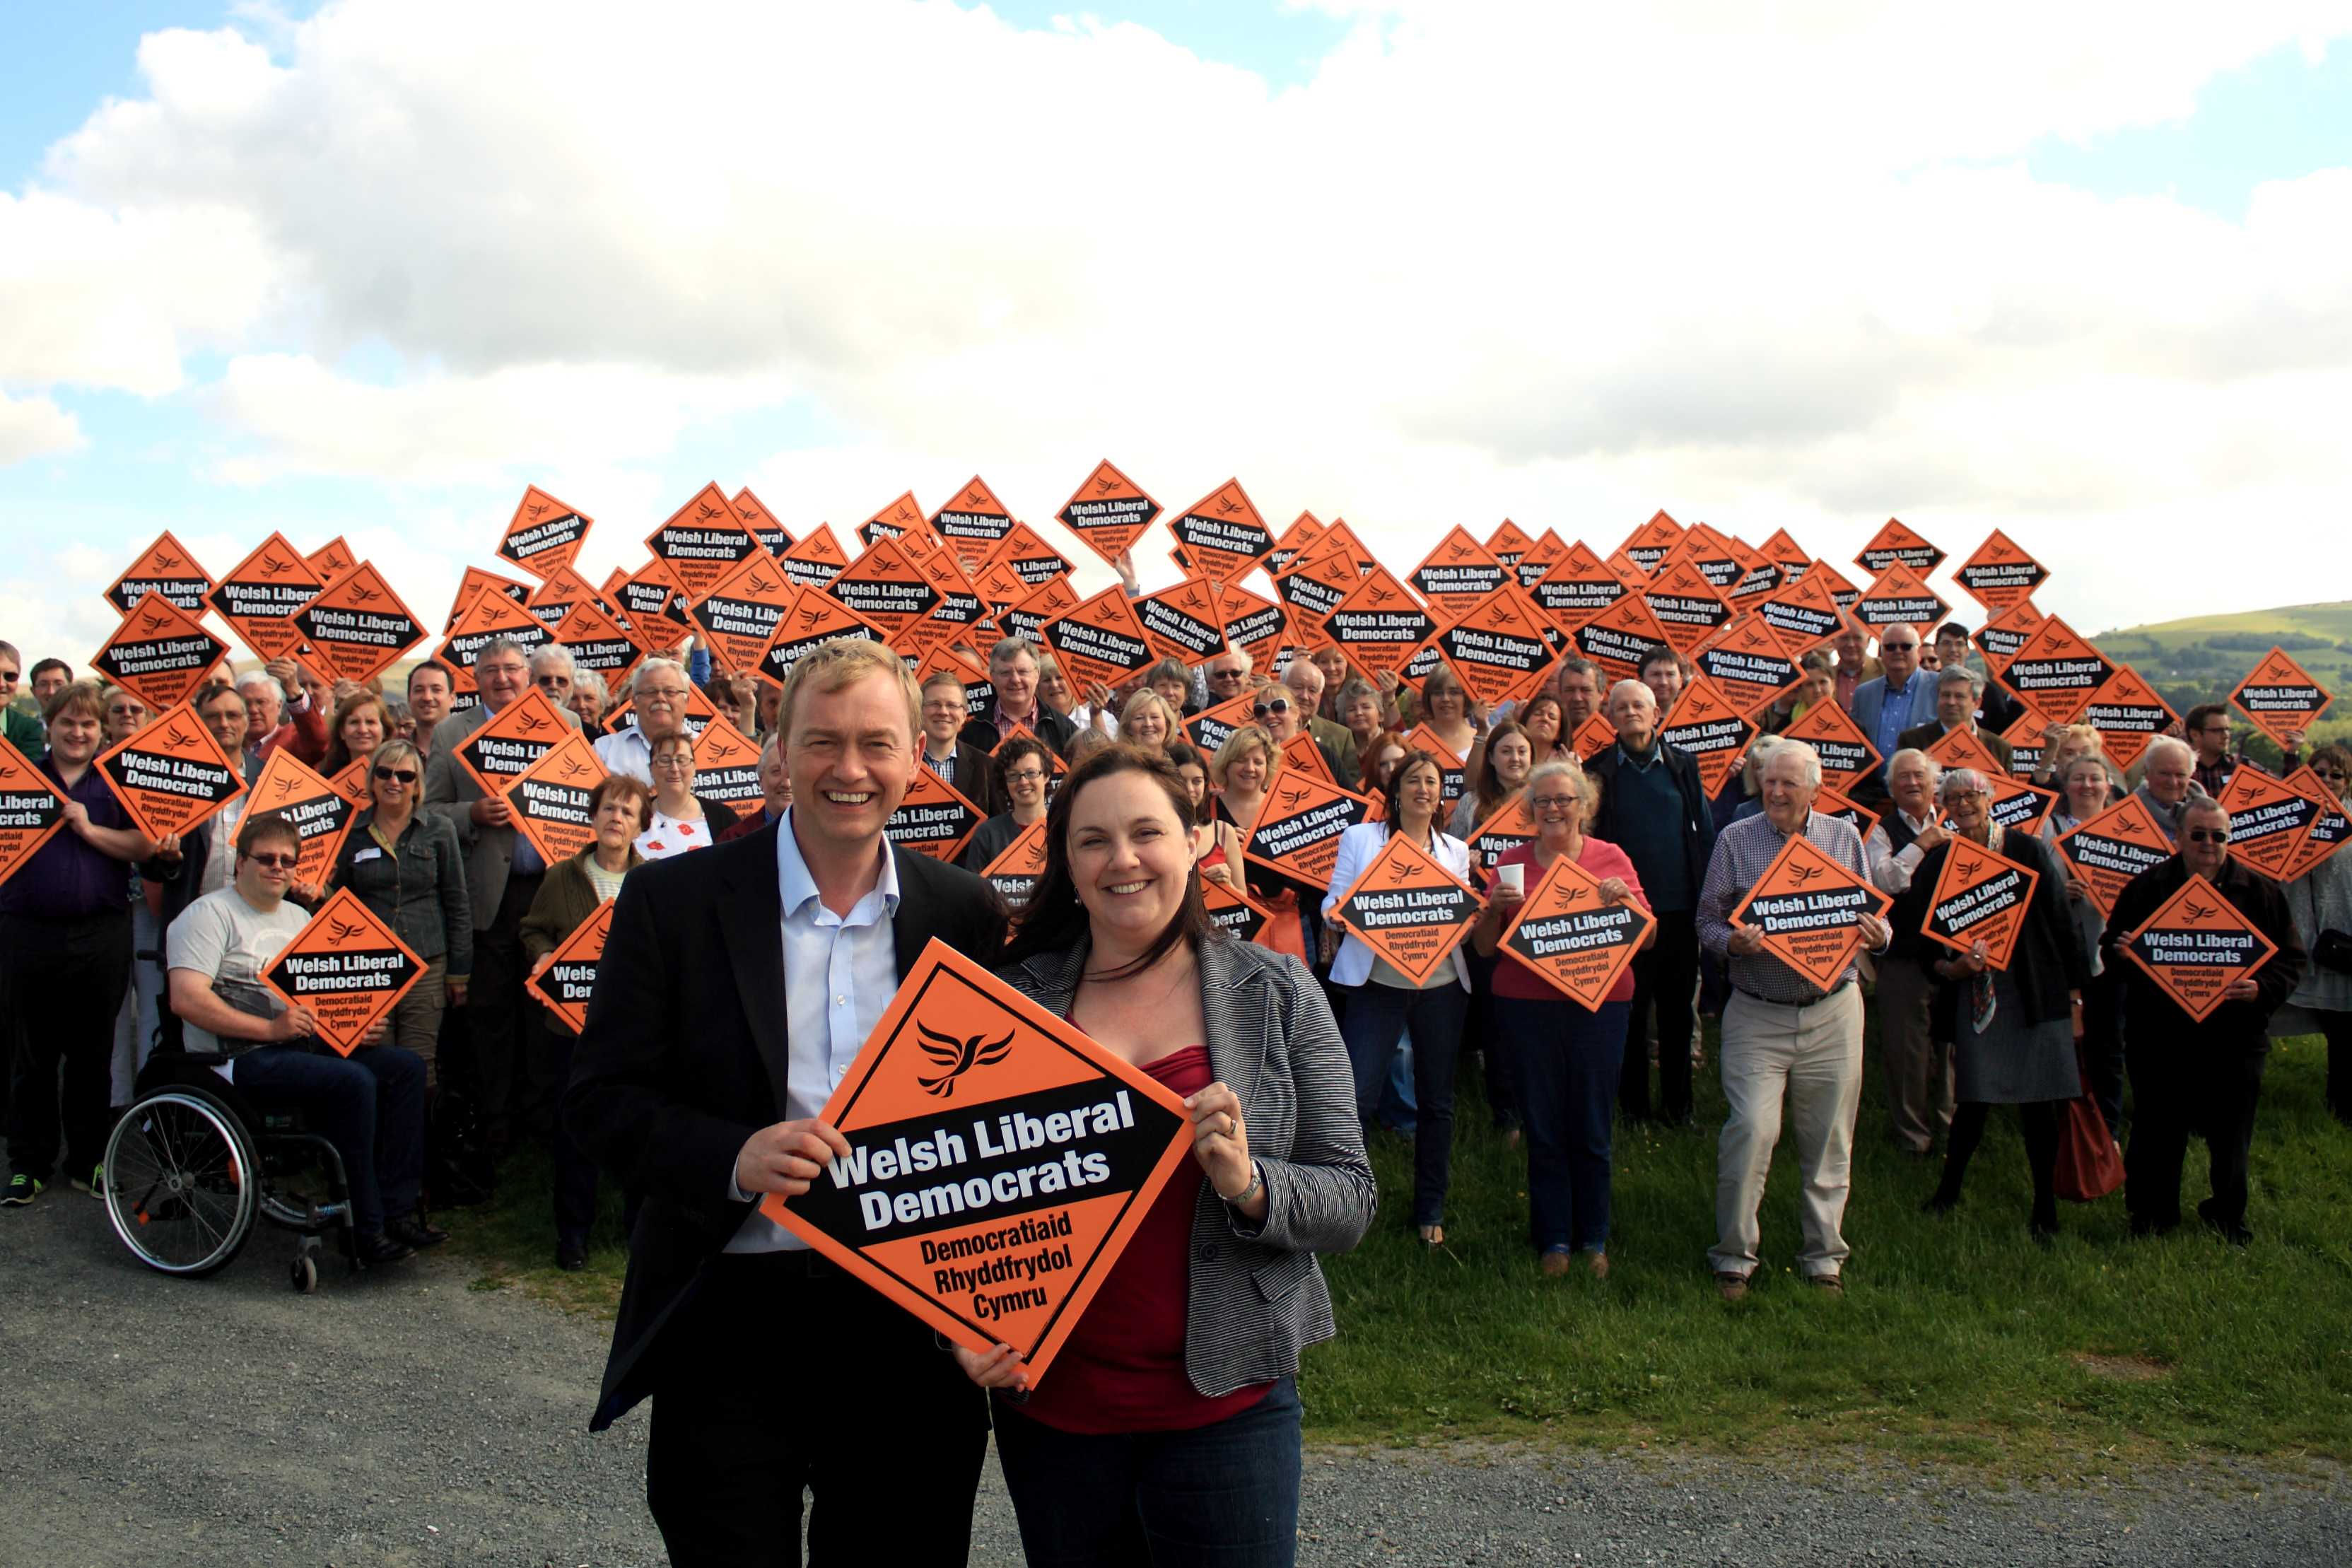 Tim Farron MP Elected Lib Dem Leader